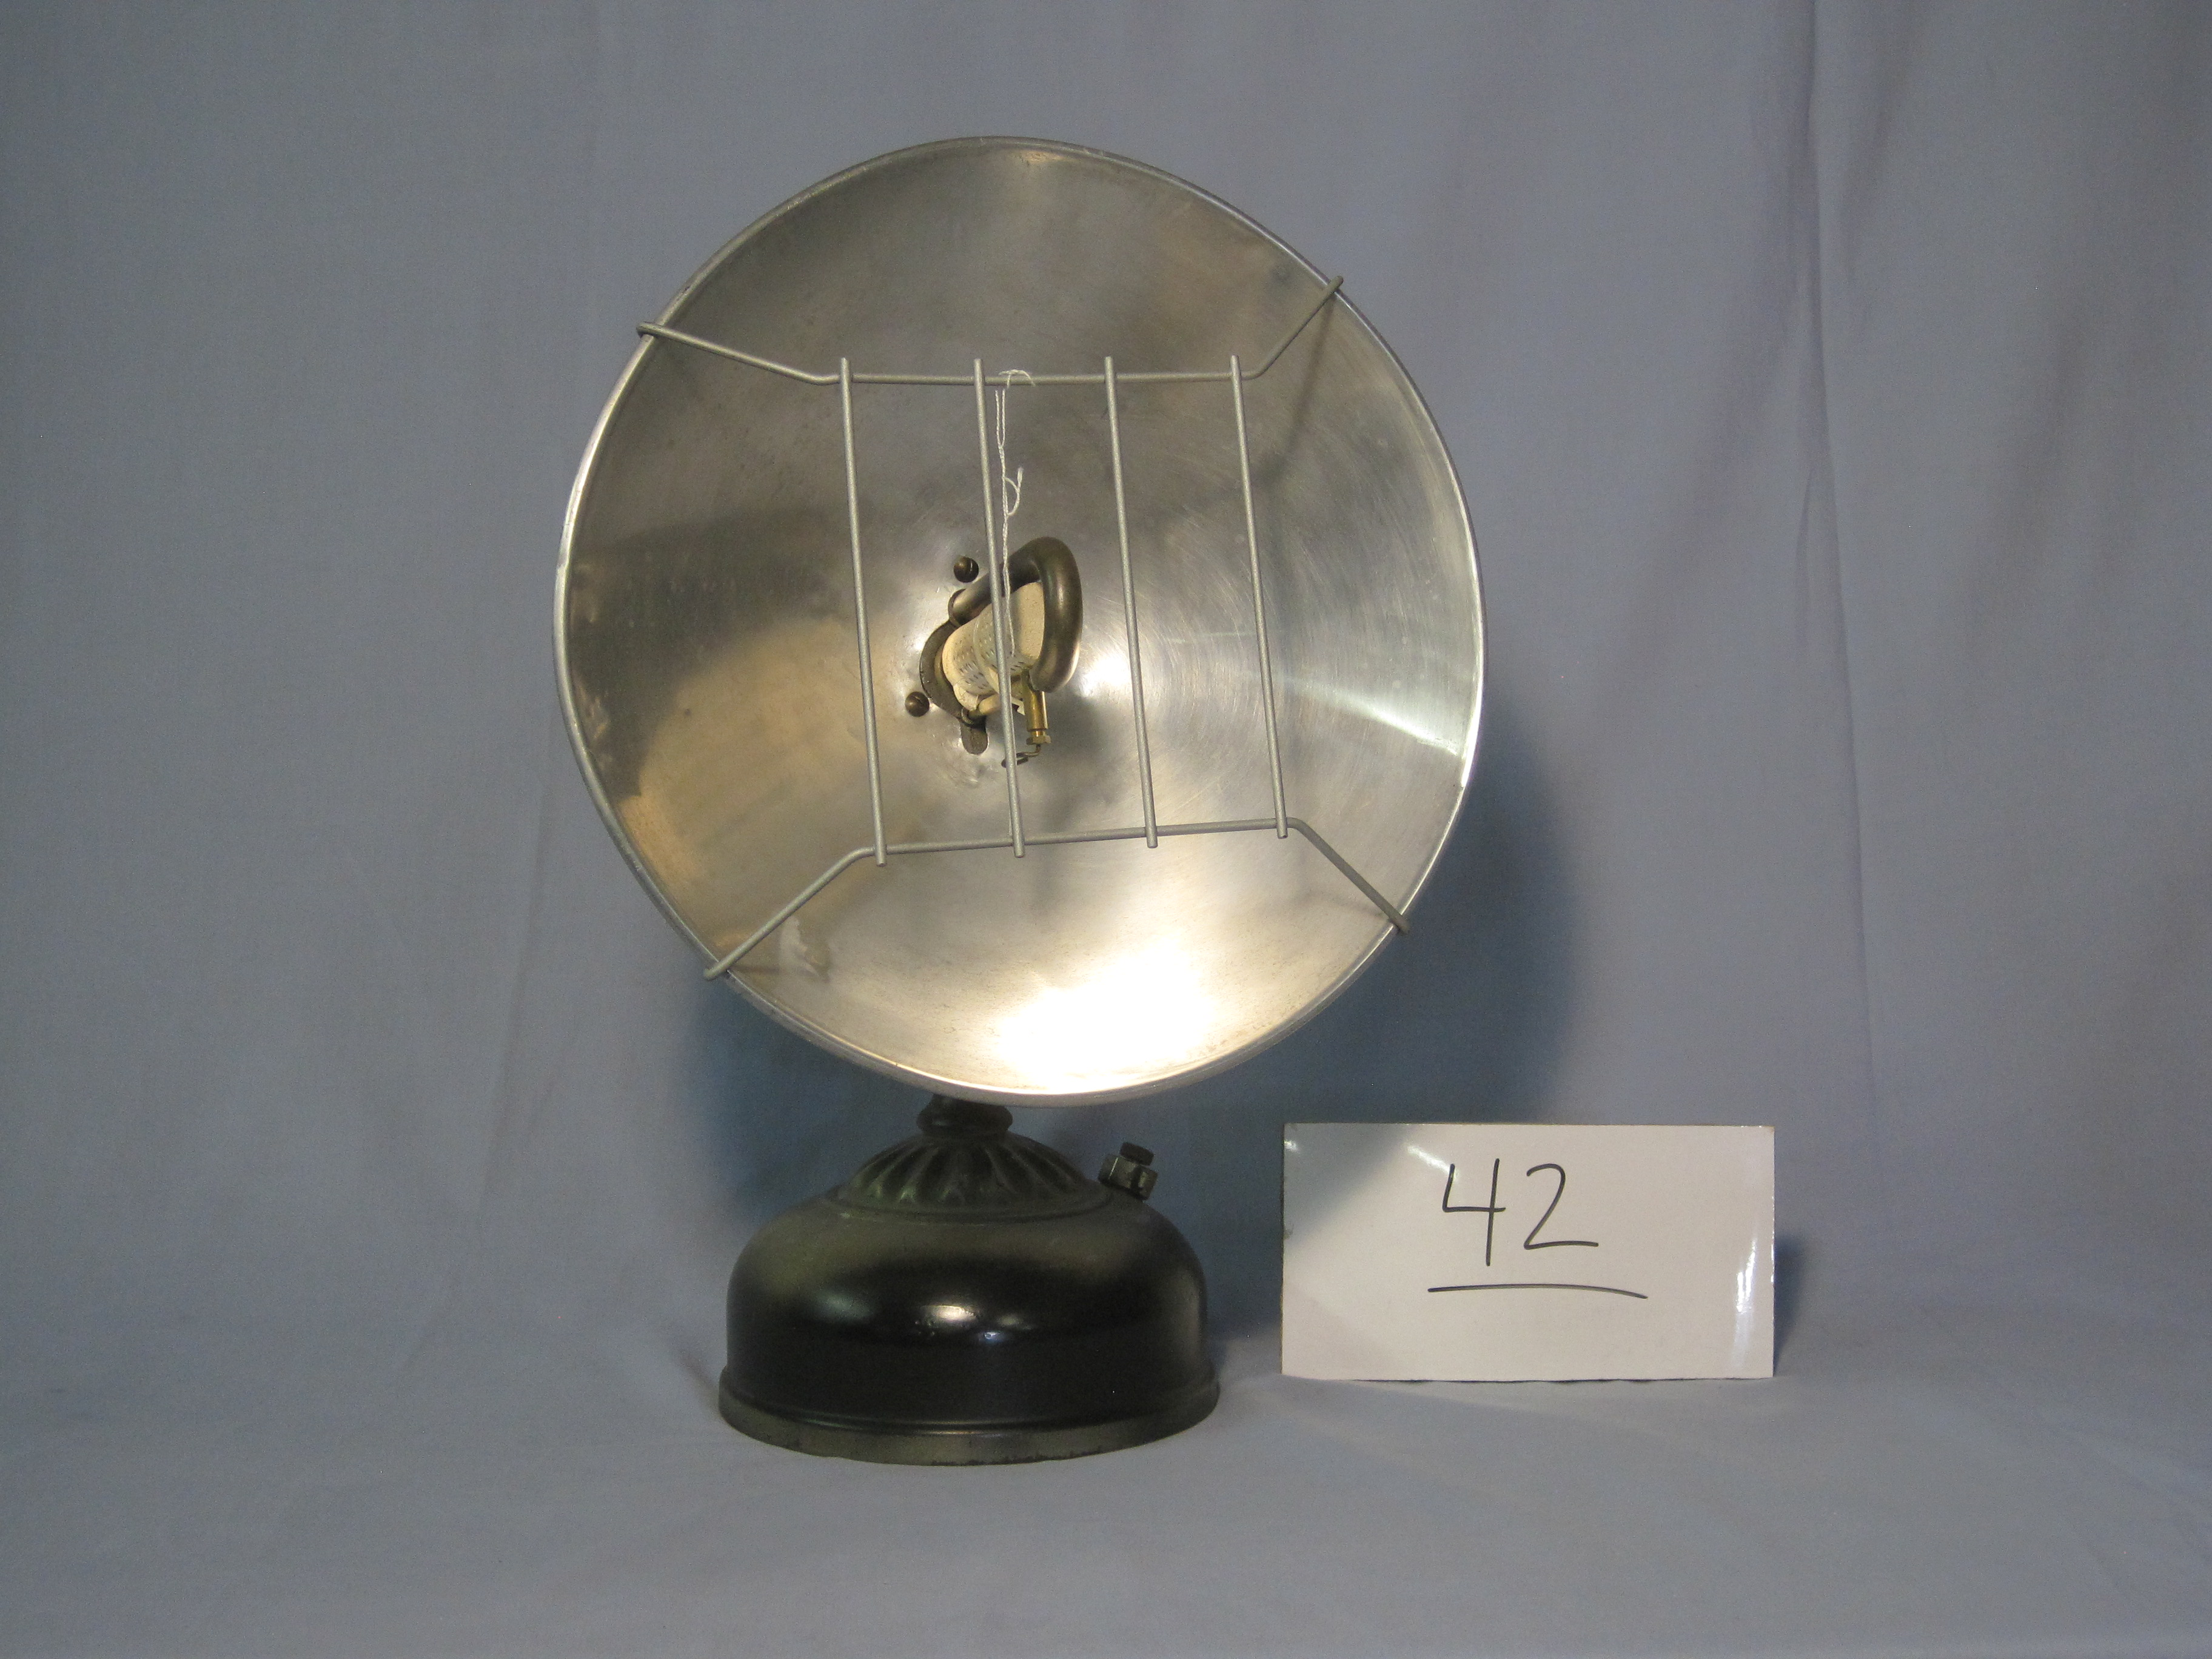 Coleman Canada Hot Ray Heater 480